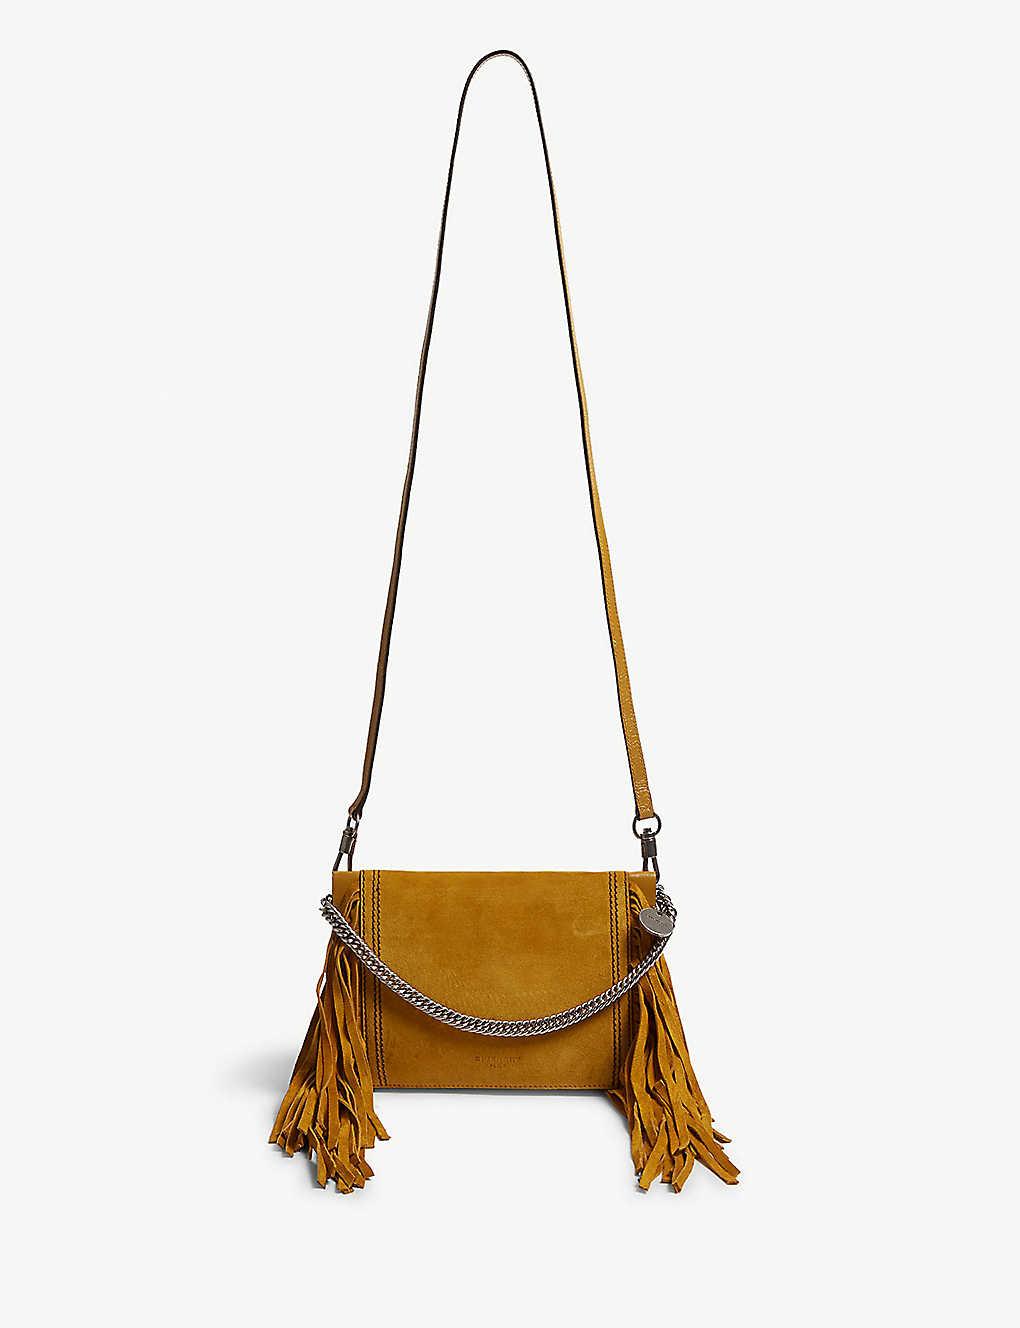 01084e31e683 GIVENCHY - Fringed leather and suede cross-body bag | Selfridges.com